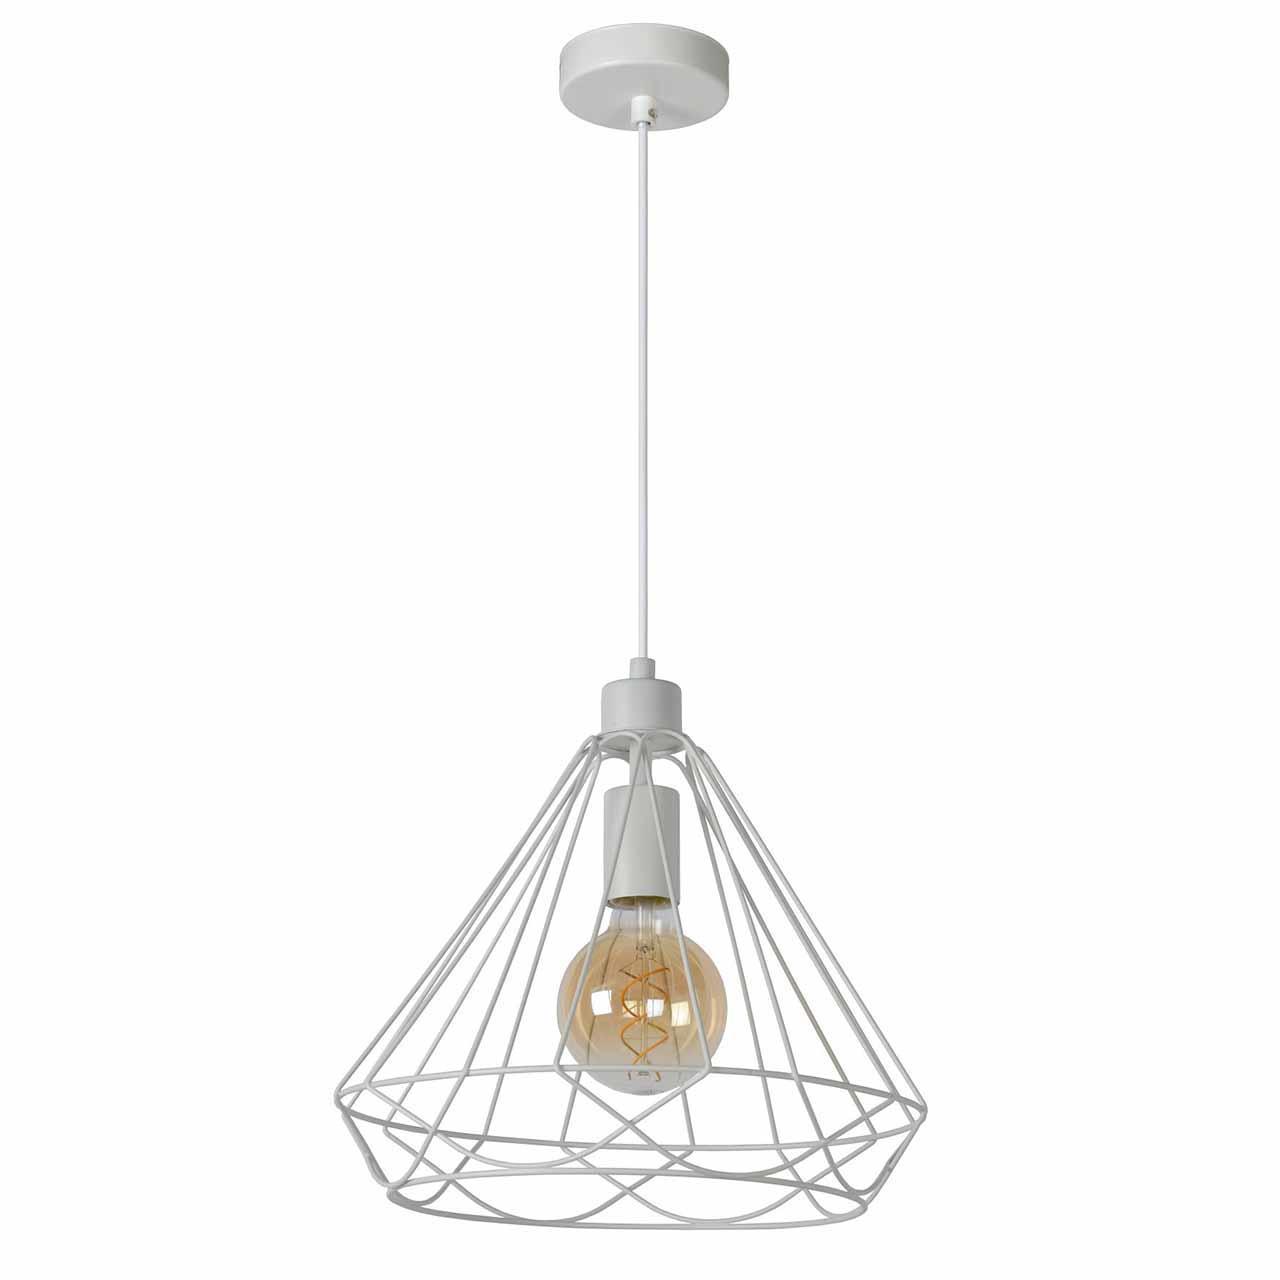 Фото - Подвесной светильник Lucide Kyara 78385/32/31 lucide подвесной светильник lucide industry 31414 01 31